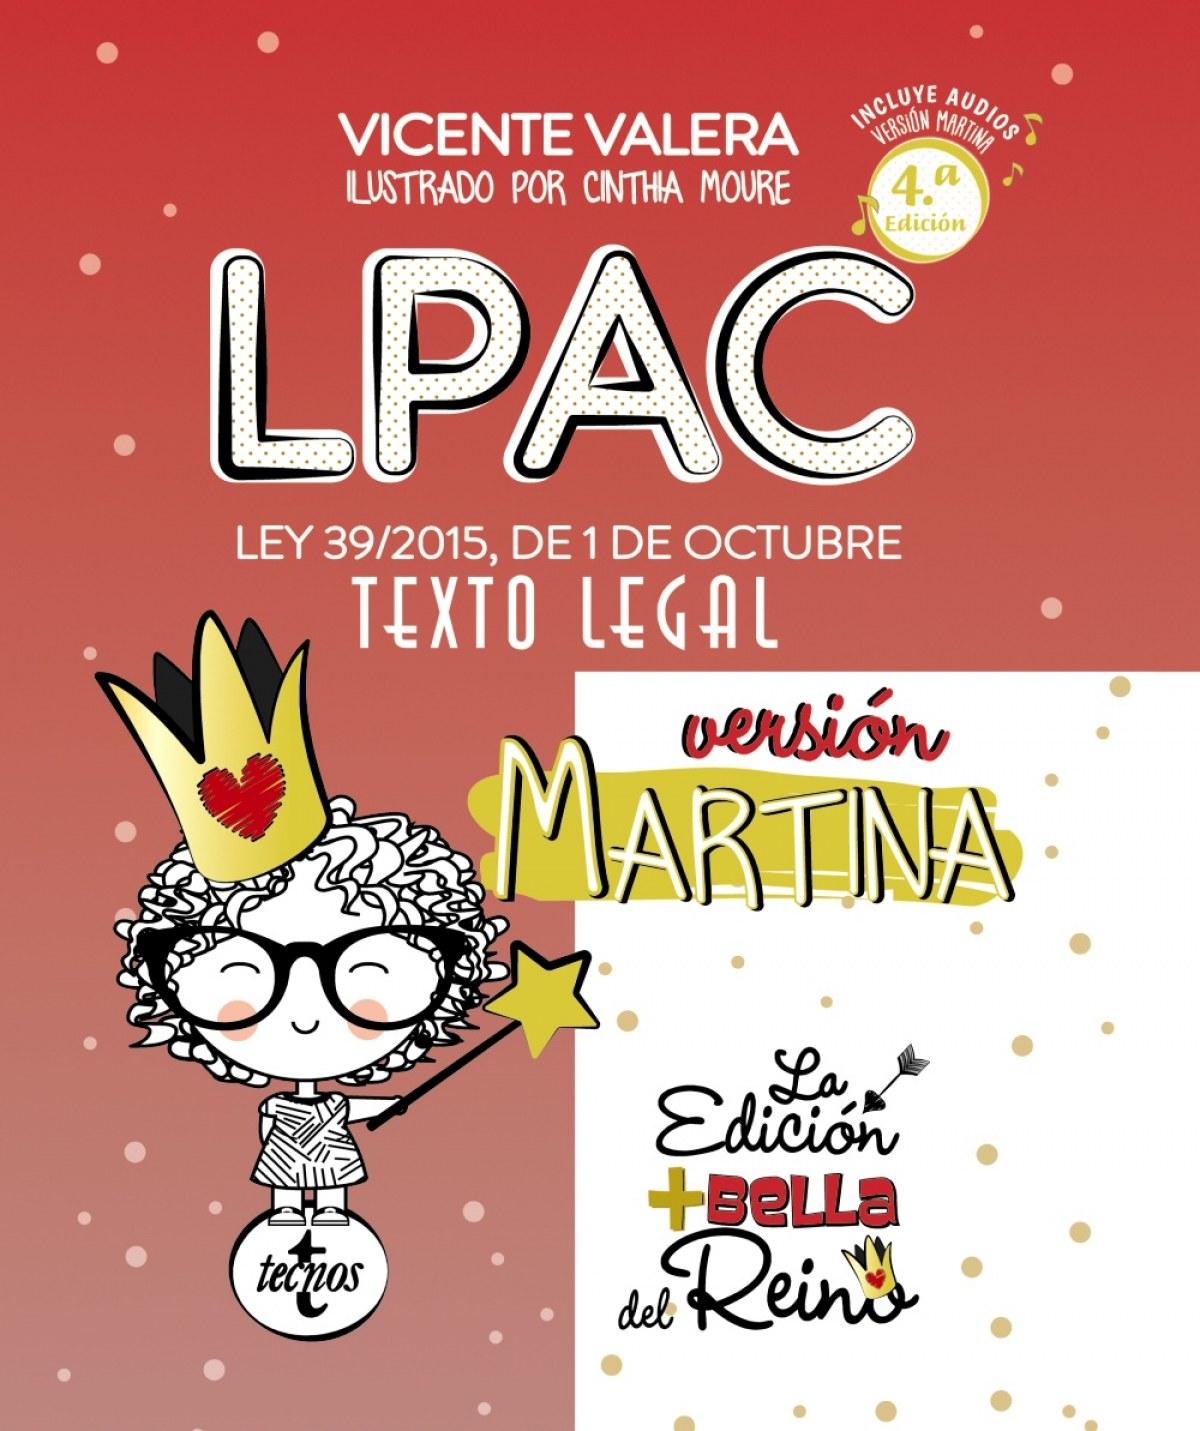 LPAC versión Martina 9788430981267